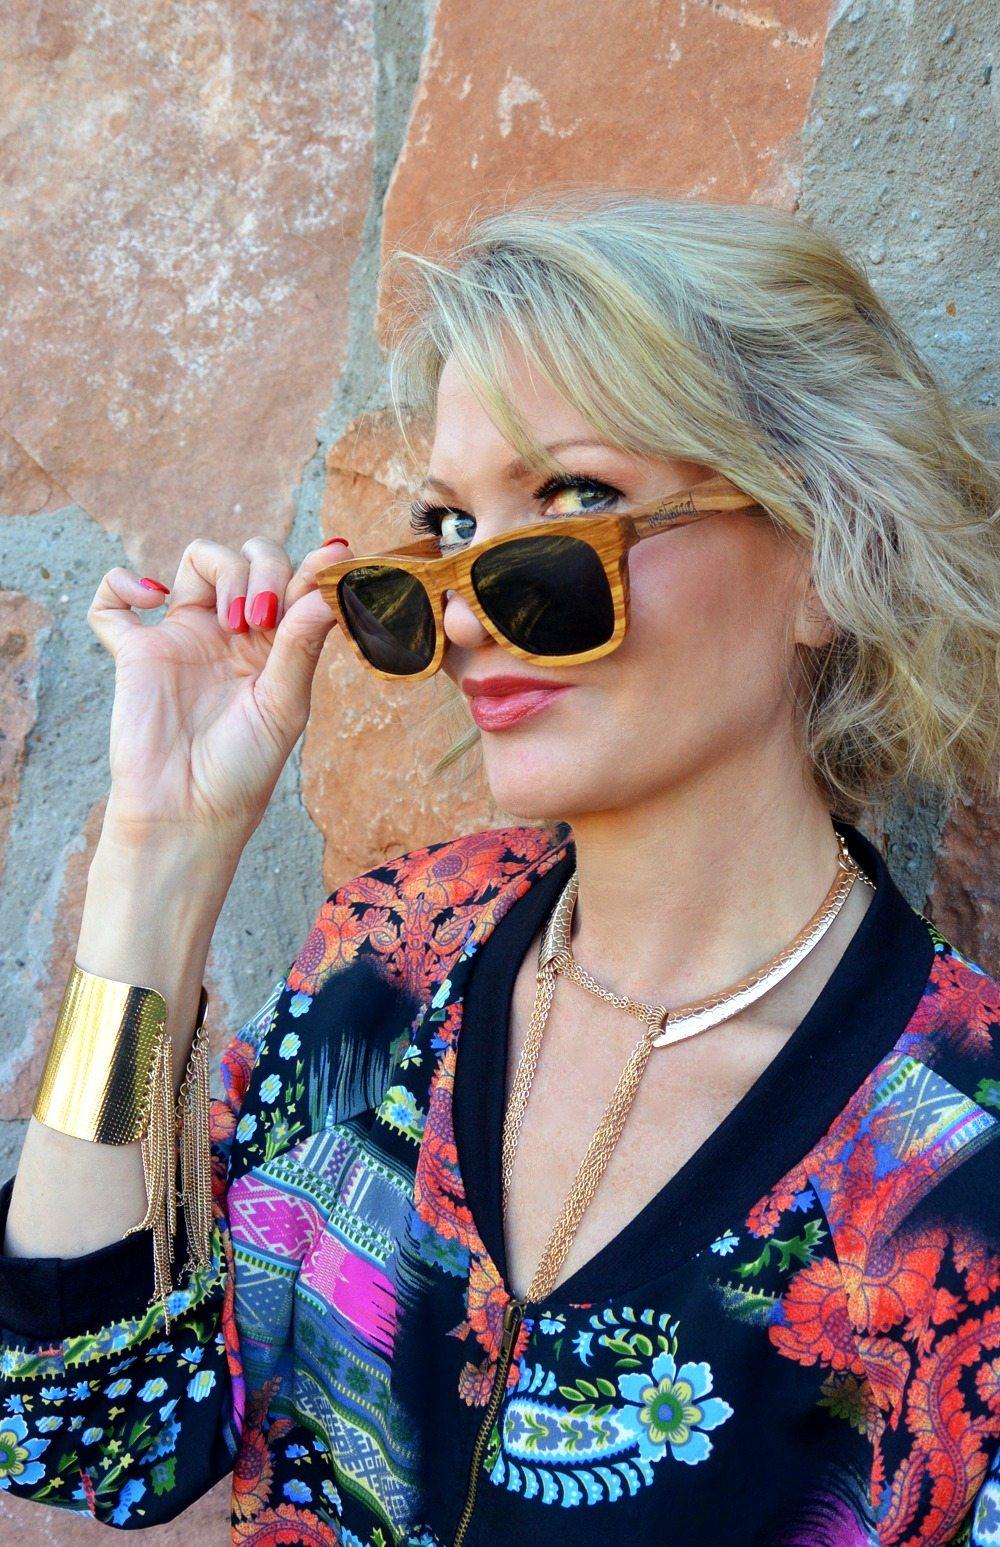 6f092abd8fe Westwood Sunglasses7 Westwood Sunglasses4 Westwood Sunglasses 6 …